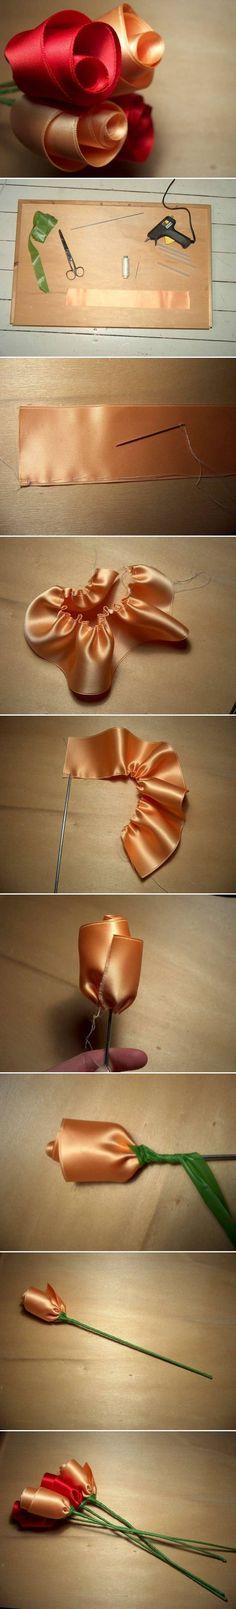 DIY Easy Satin Ribbon Roses | iCreativeIdeas.com LIKE Us on Facebook ==> https://www.facebook.com/icreativeideas